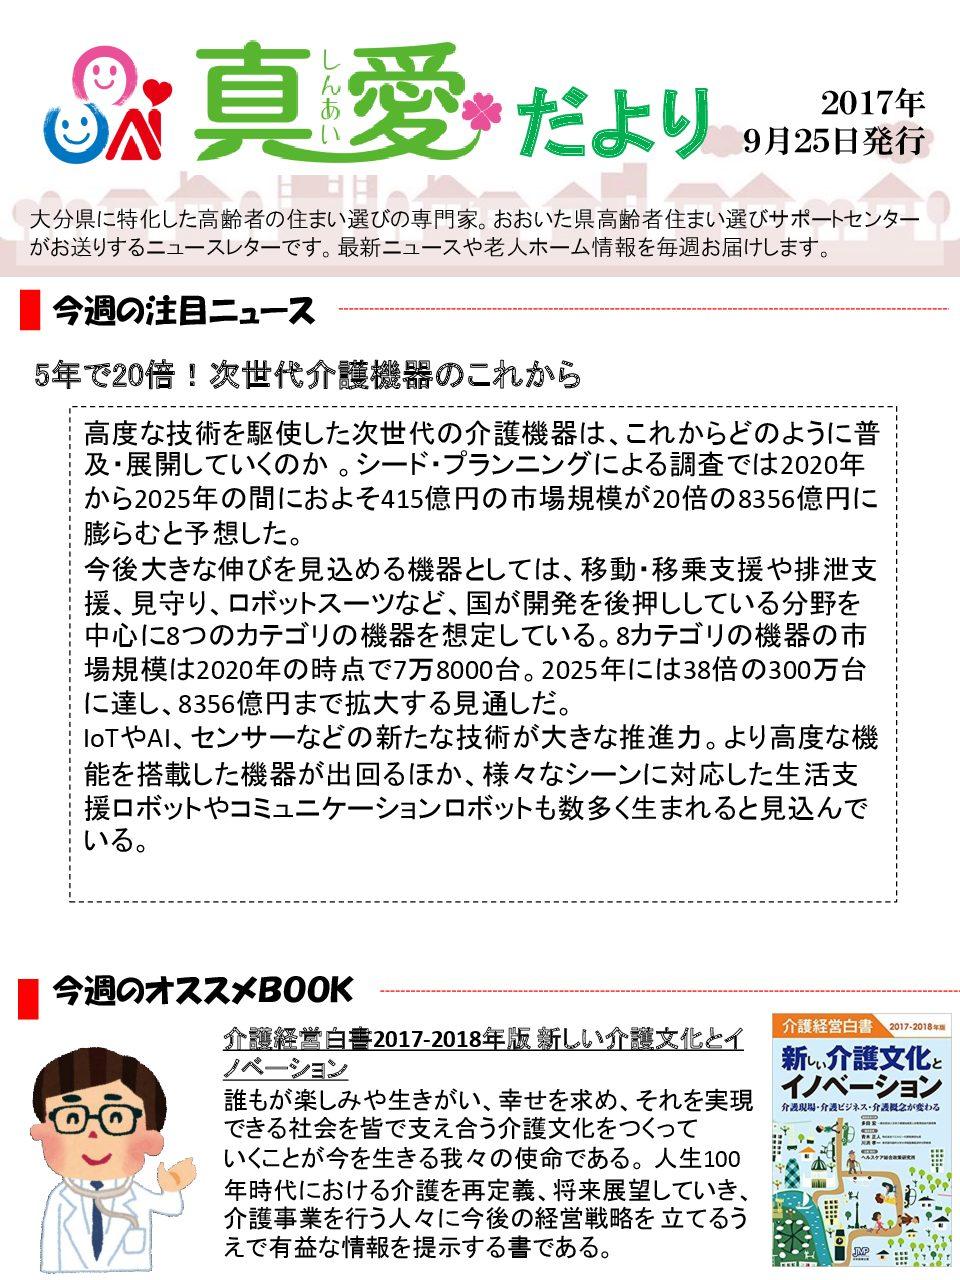 【Vol.12】 2017.09.25発行